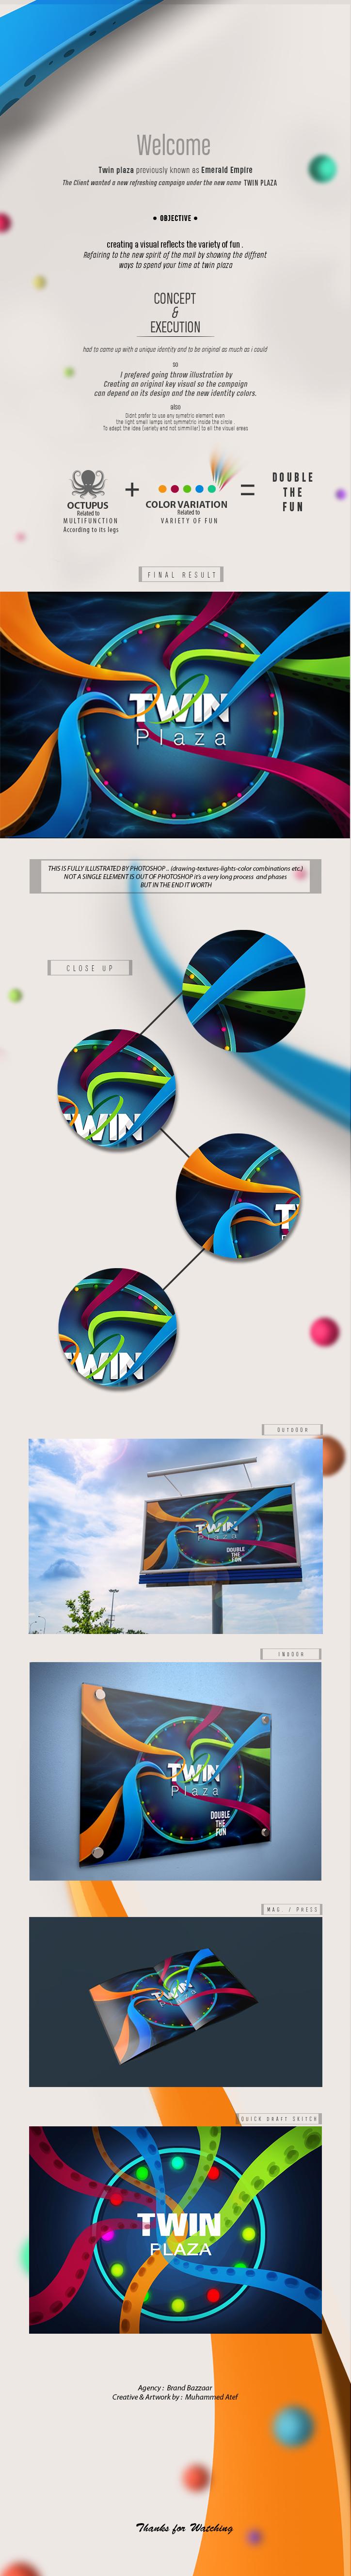 TWIN PLAZA Key Visual on Behance